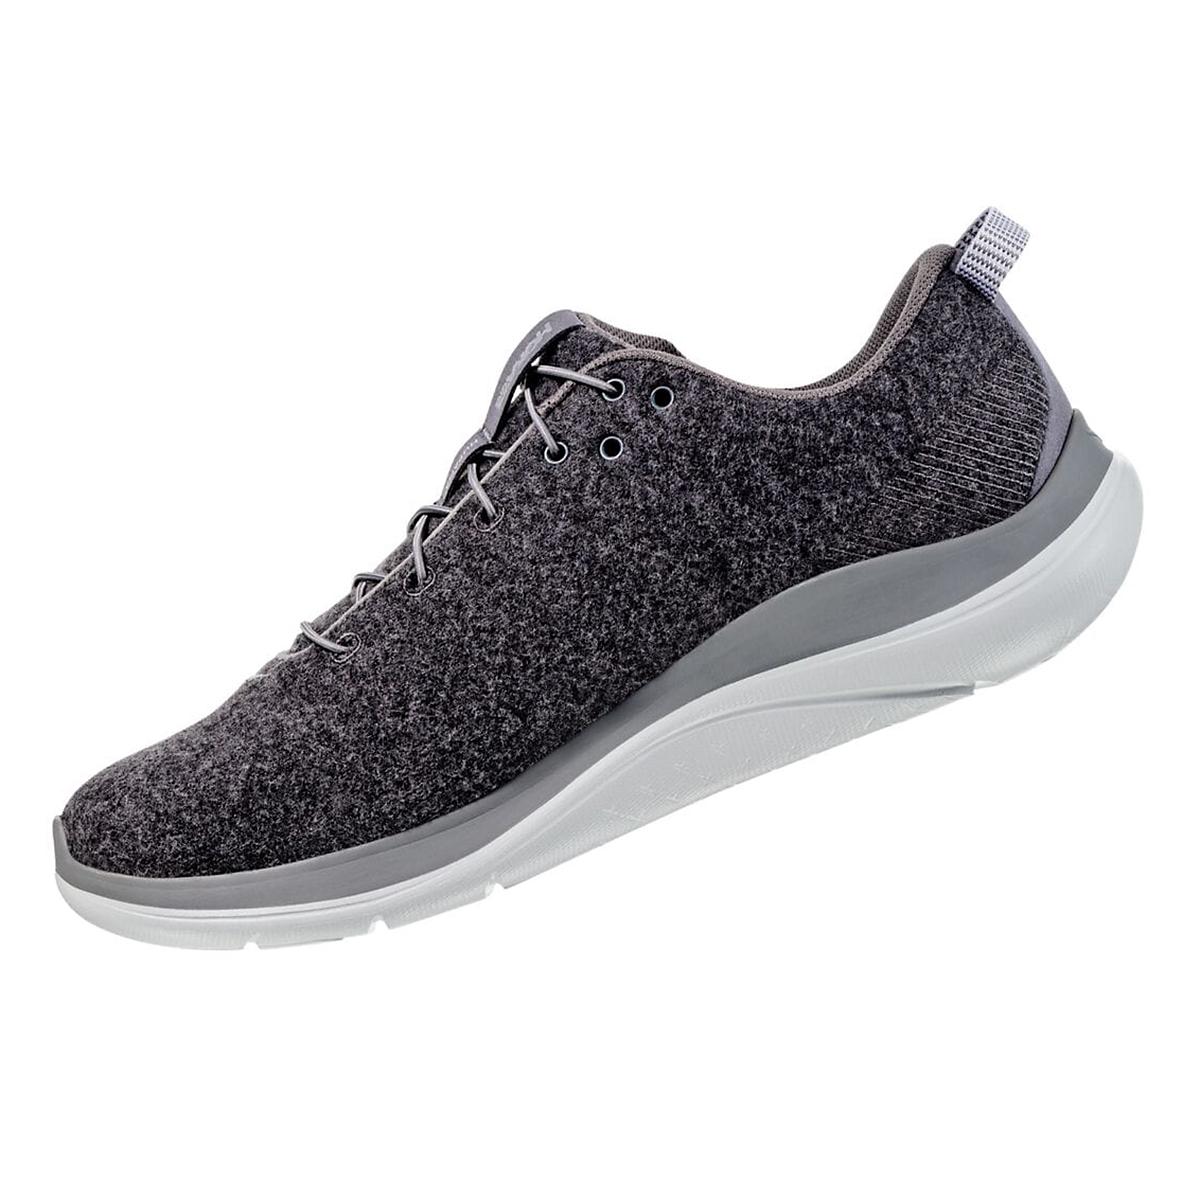 Women's Hoka One One Hupana Flow Wool Running Shoe - Color: Dark Shadow/Wild Dove - Size: 5 - Width: Regular, Dark Shadow/Wild Dove, large, image 2